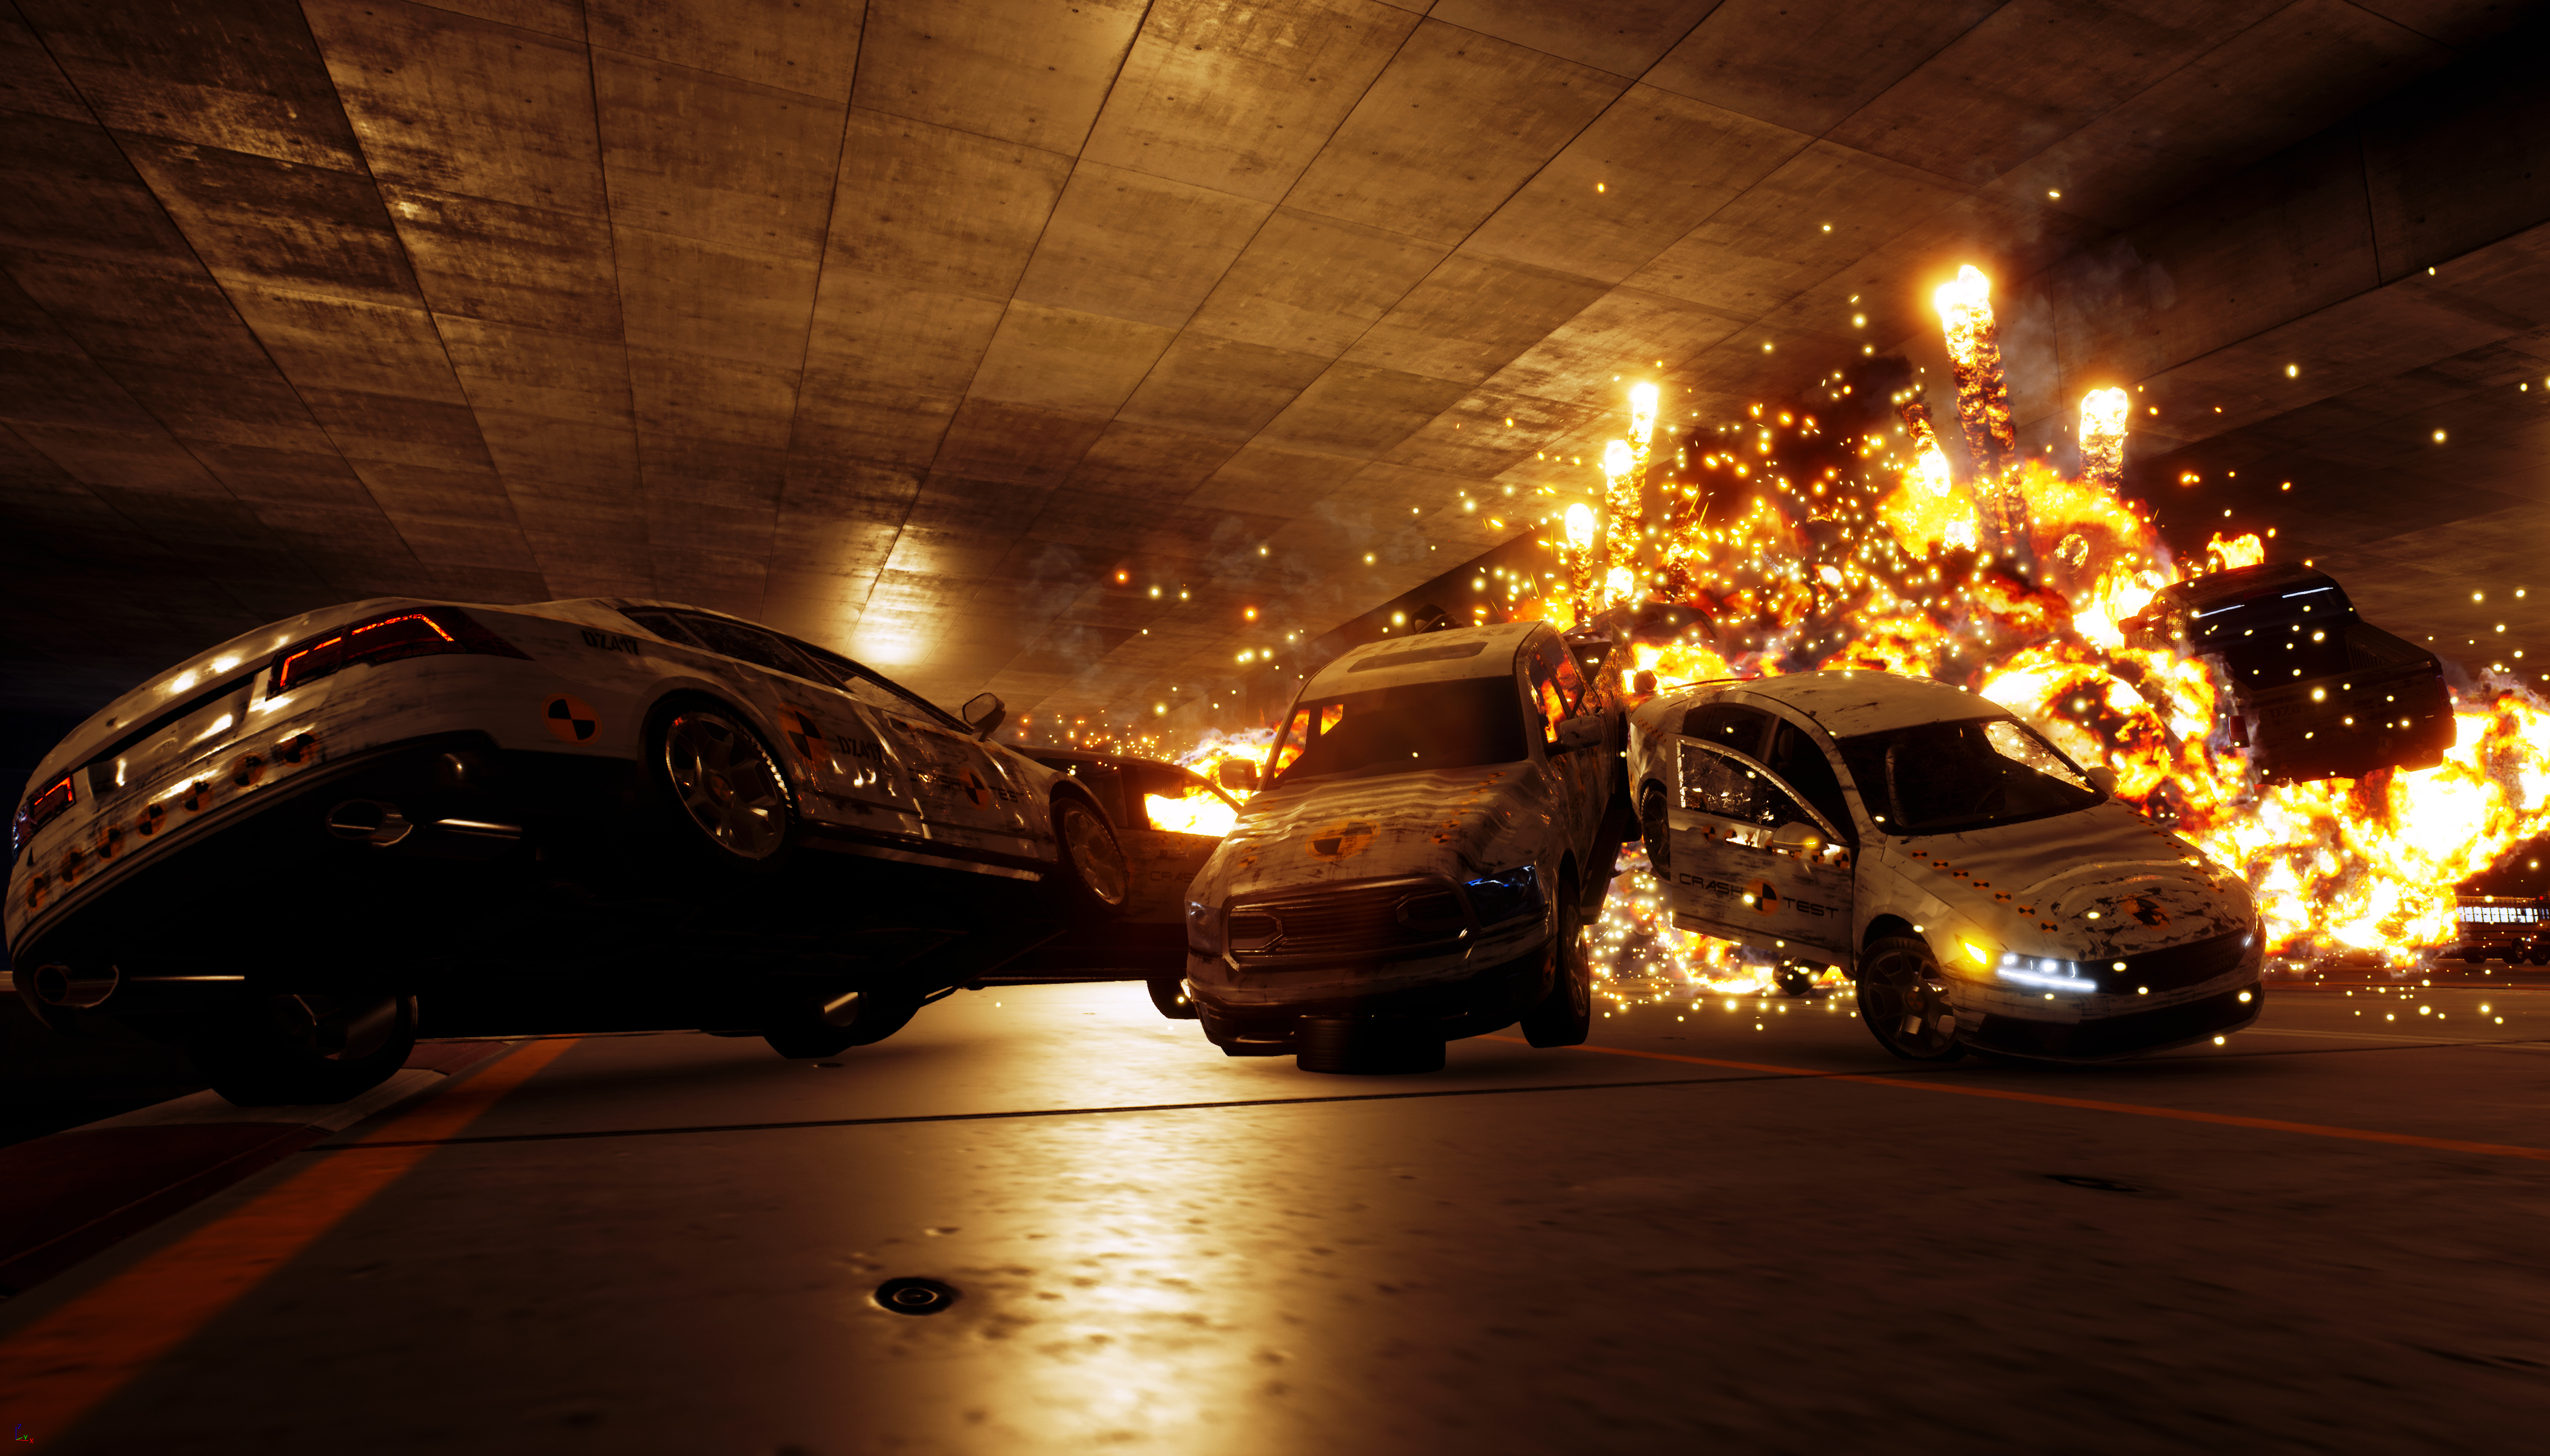 Three Fields announces Danger Zone, a spiritual successor to Burnout's crash mode screenshot